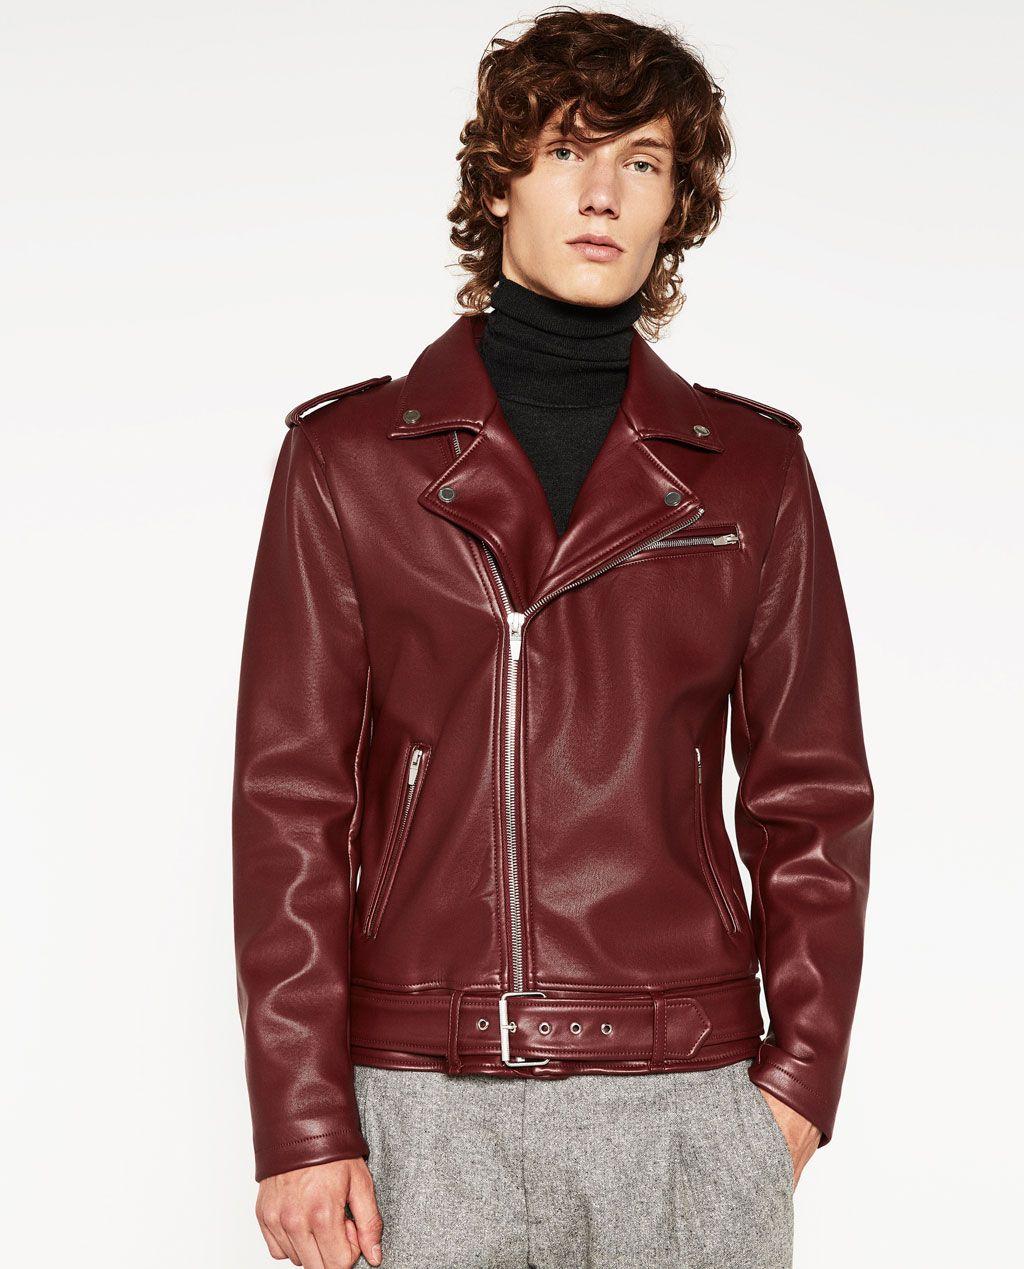 ZARA MAN FAUX LEATHER JACKET Tight leather pants